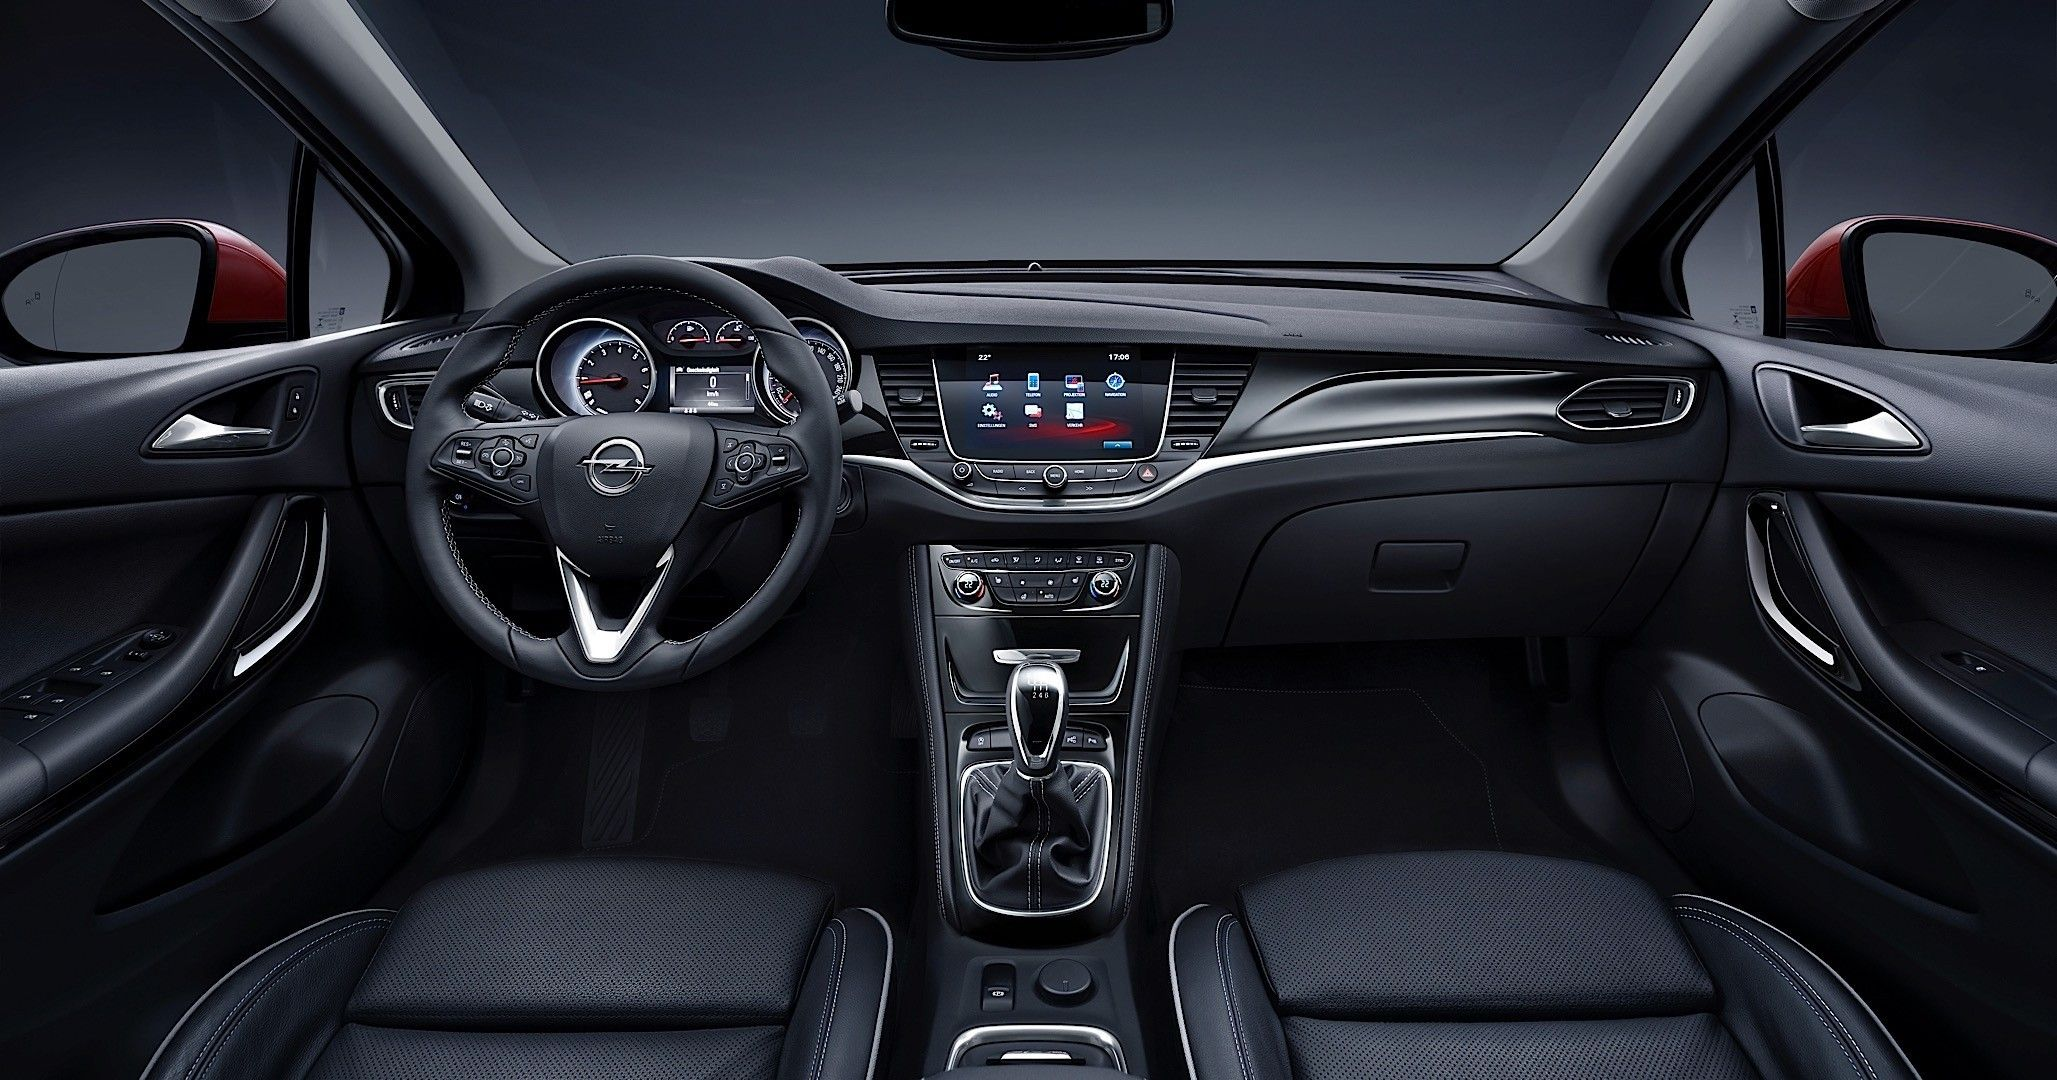 Casalmotor Opel New Cars Range Rover Evoque